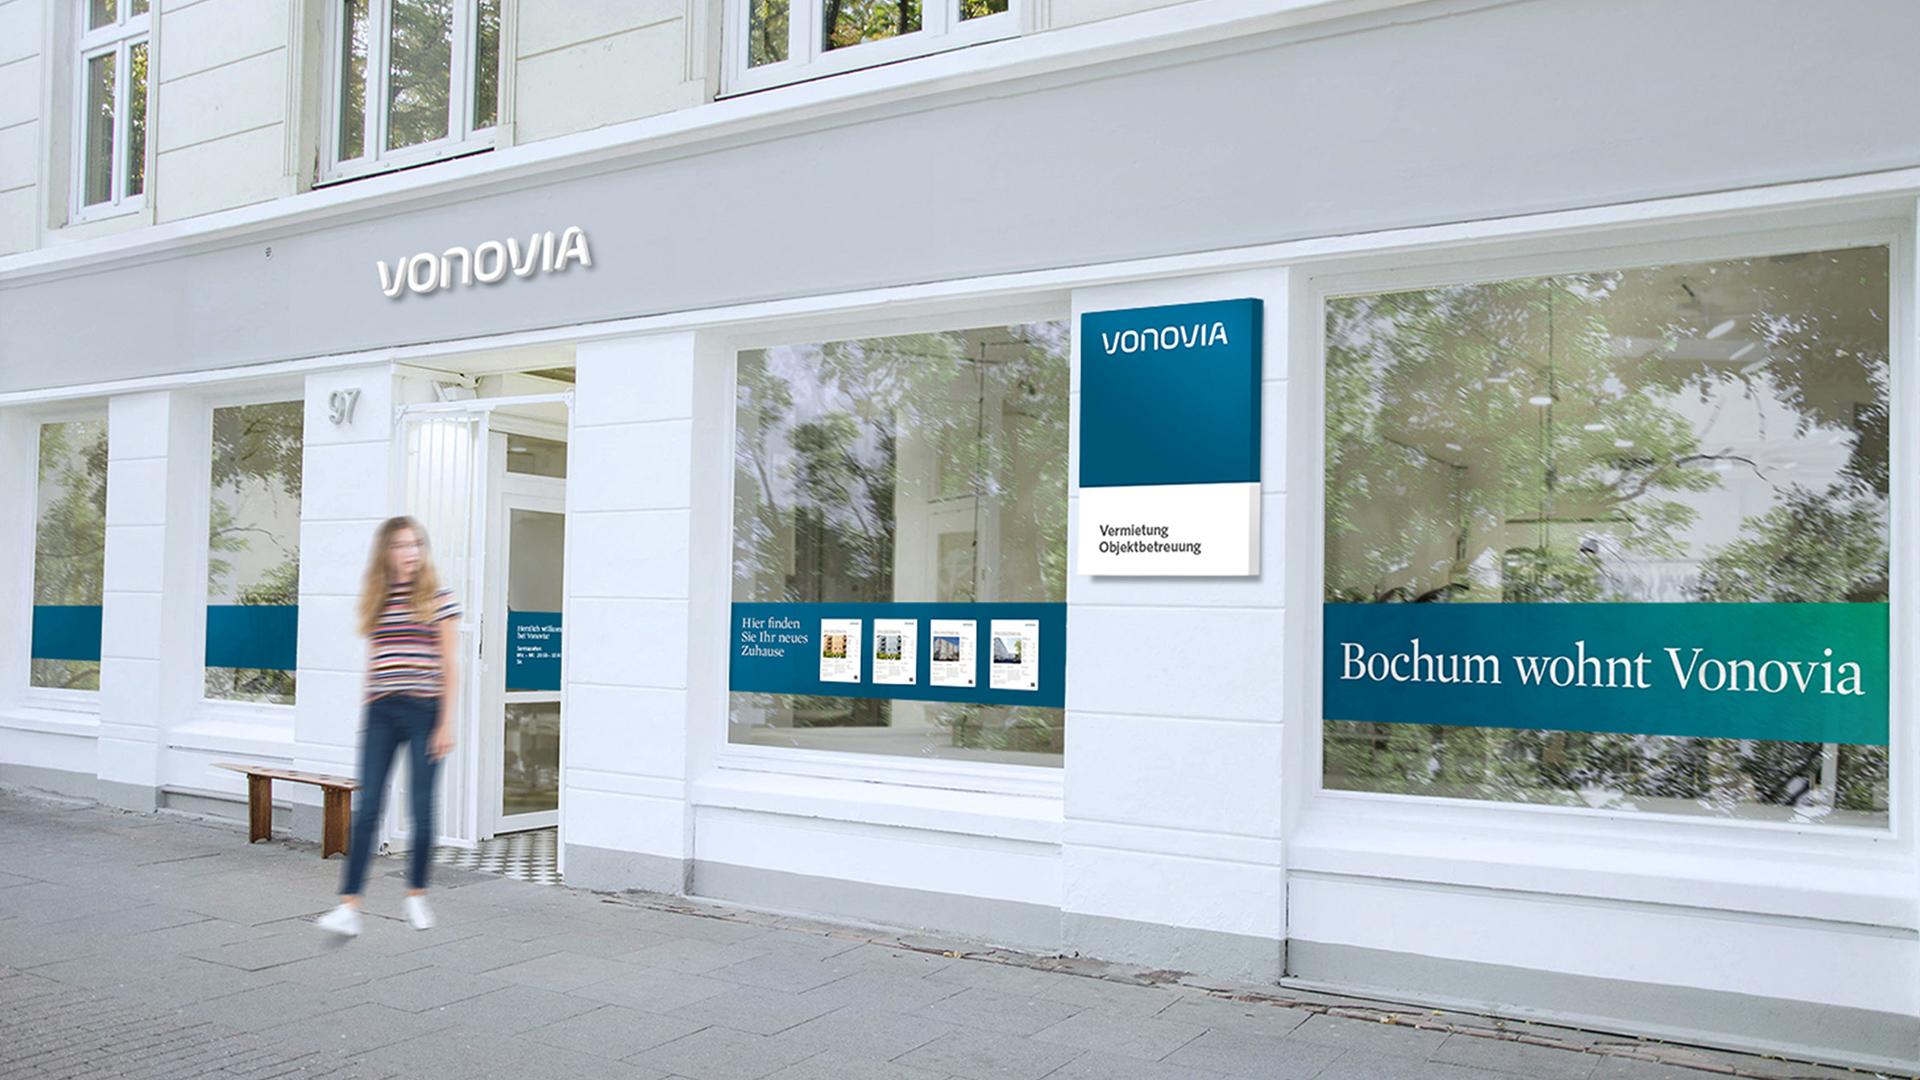 Vonovia - Real estate, Showroom